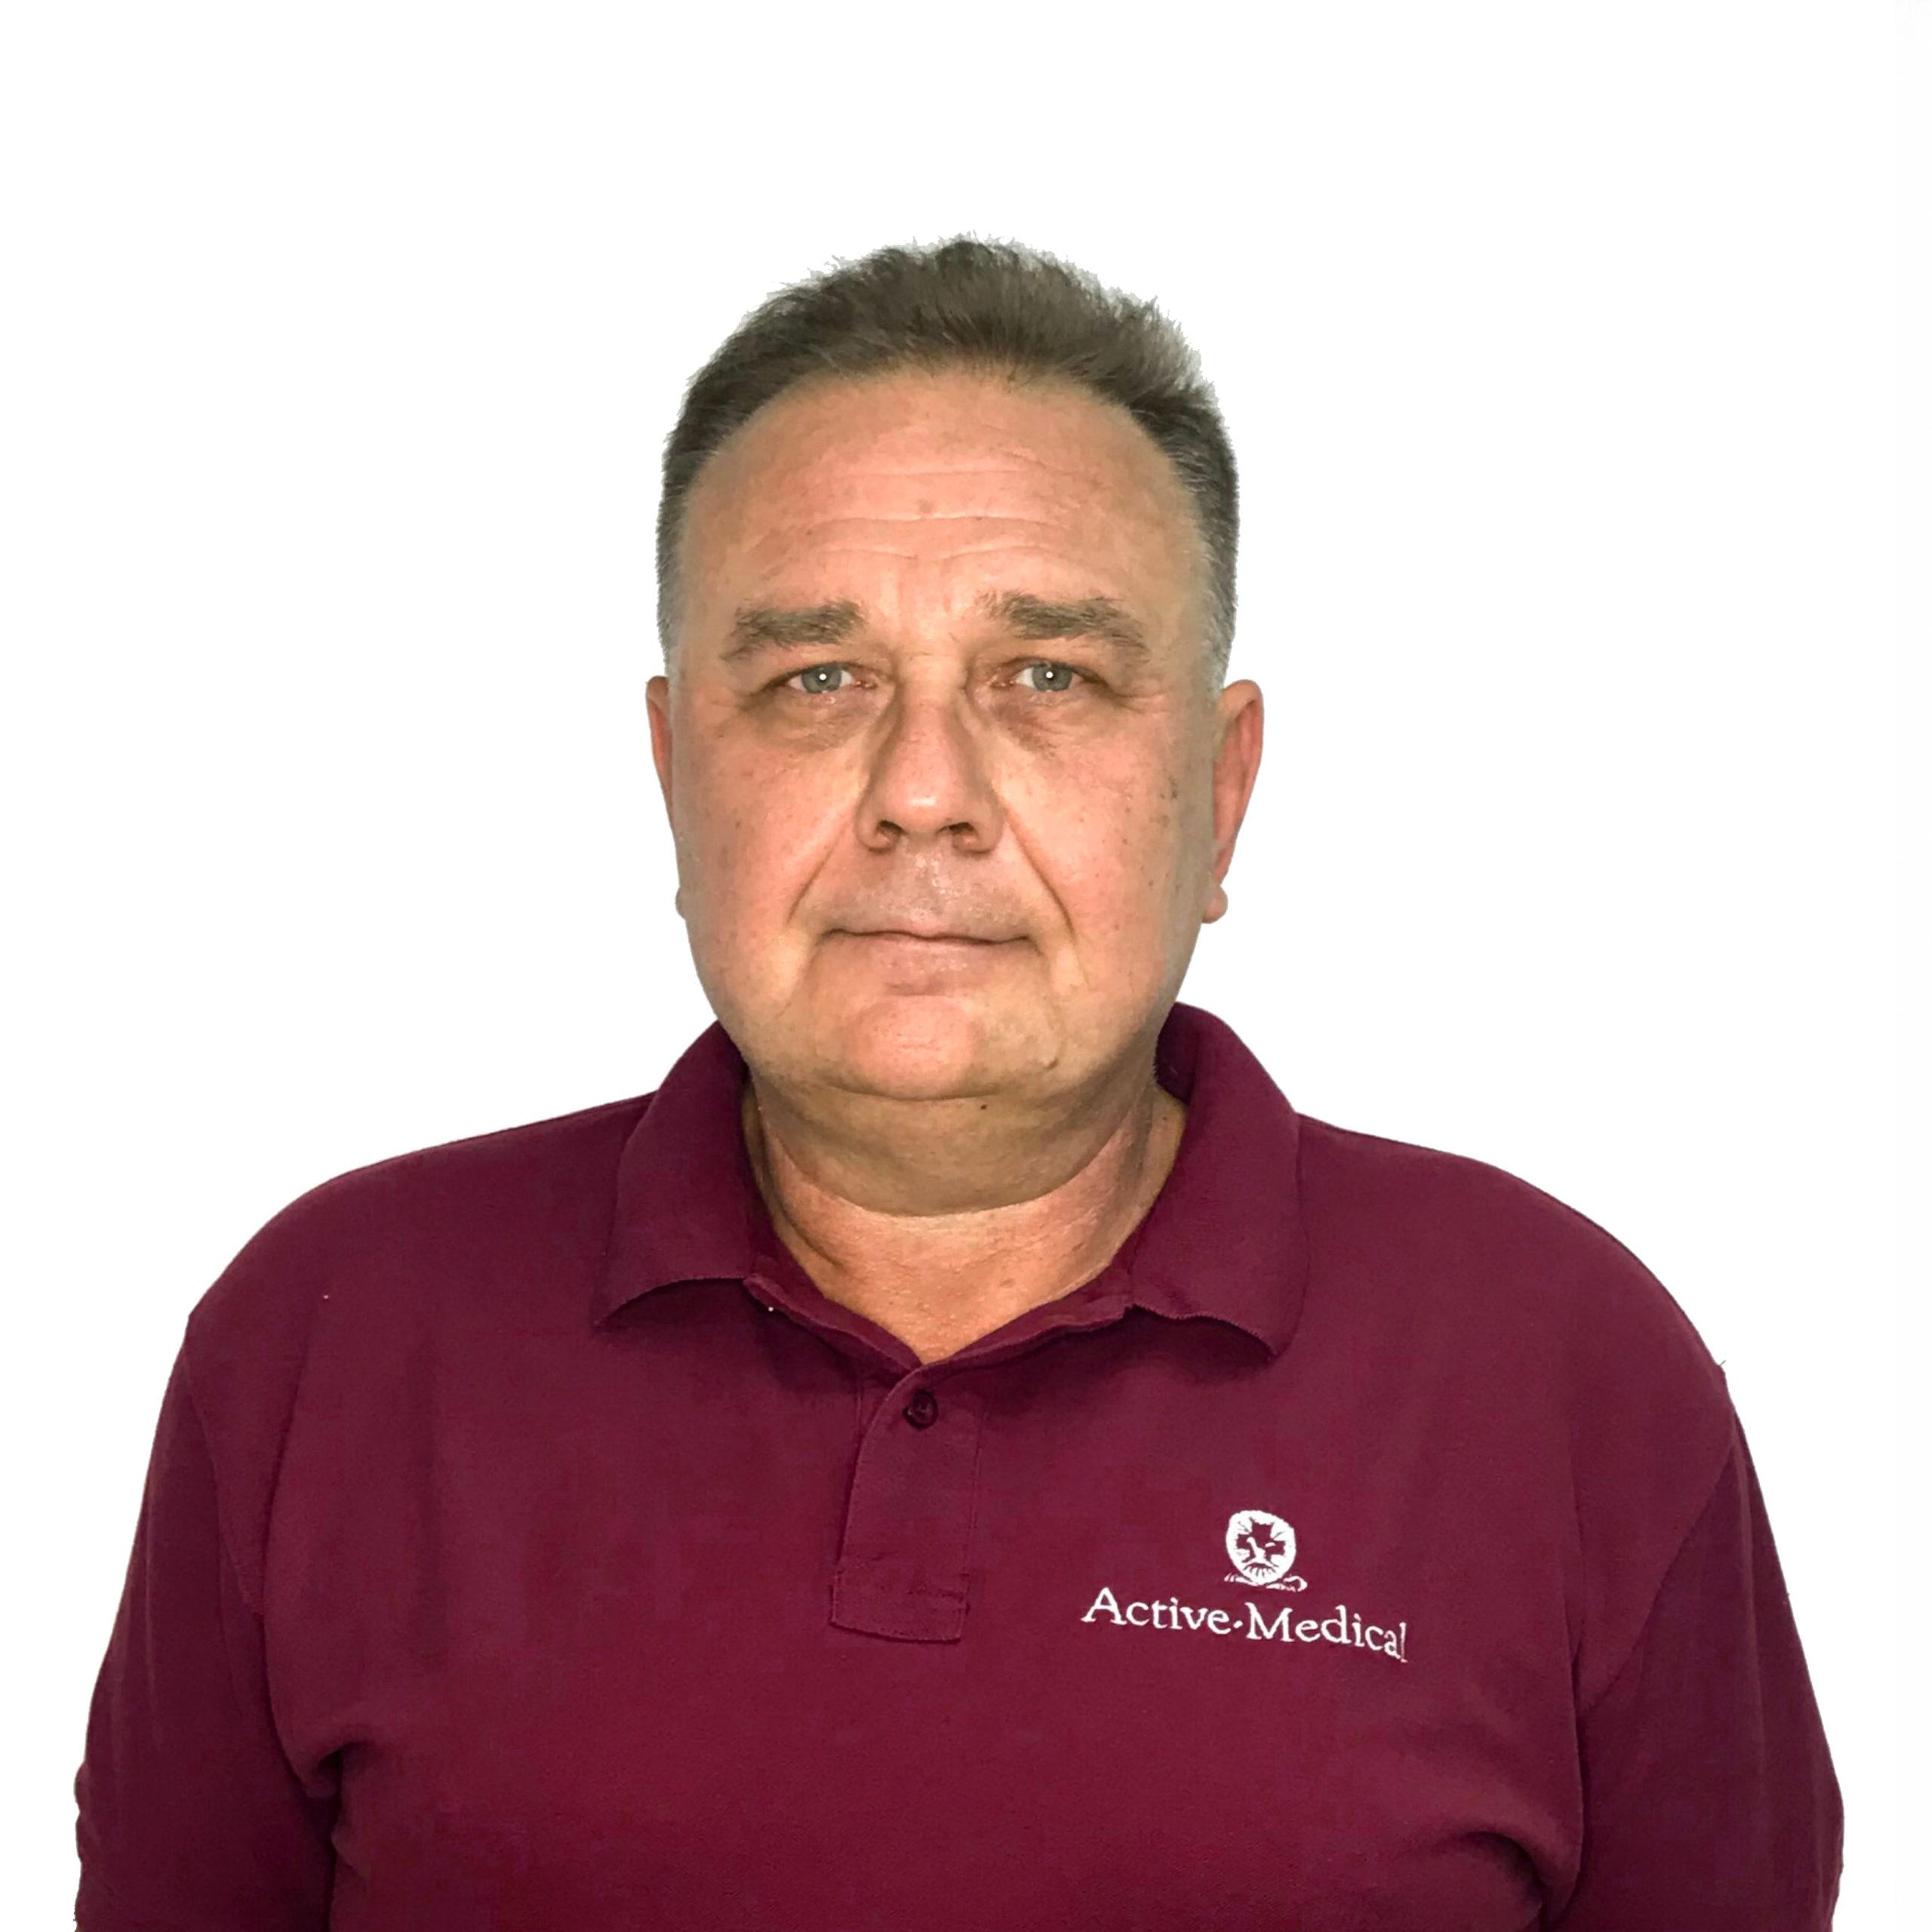 Воронков Андрей Юрьевич